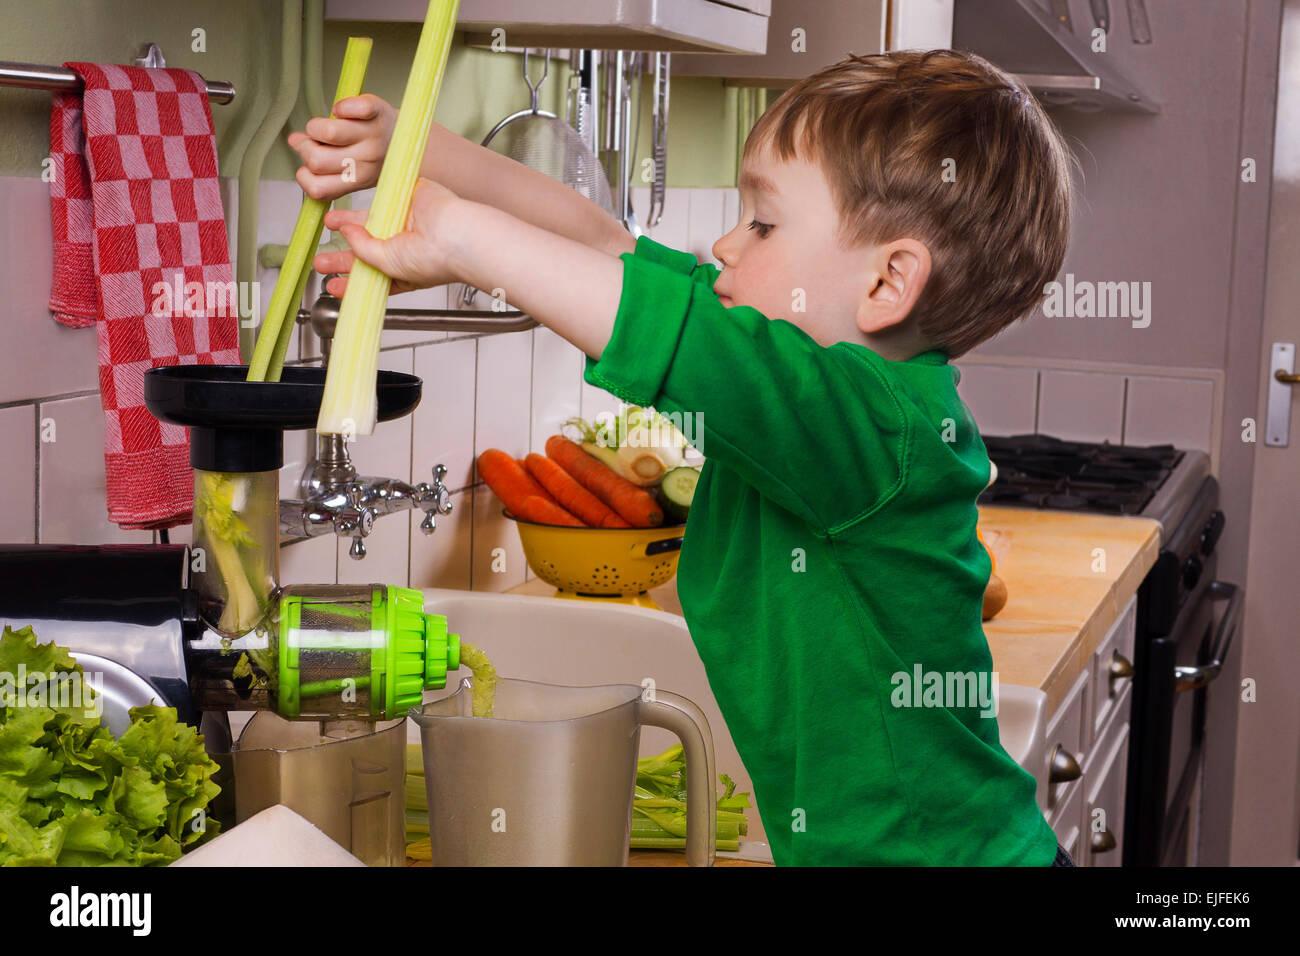 Little Boy haciendo jugo verde Imagen De Stock